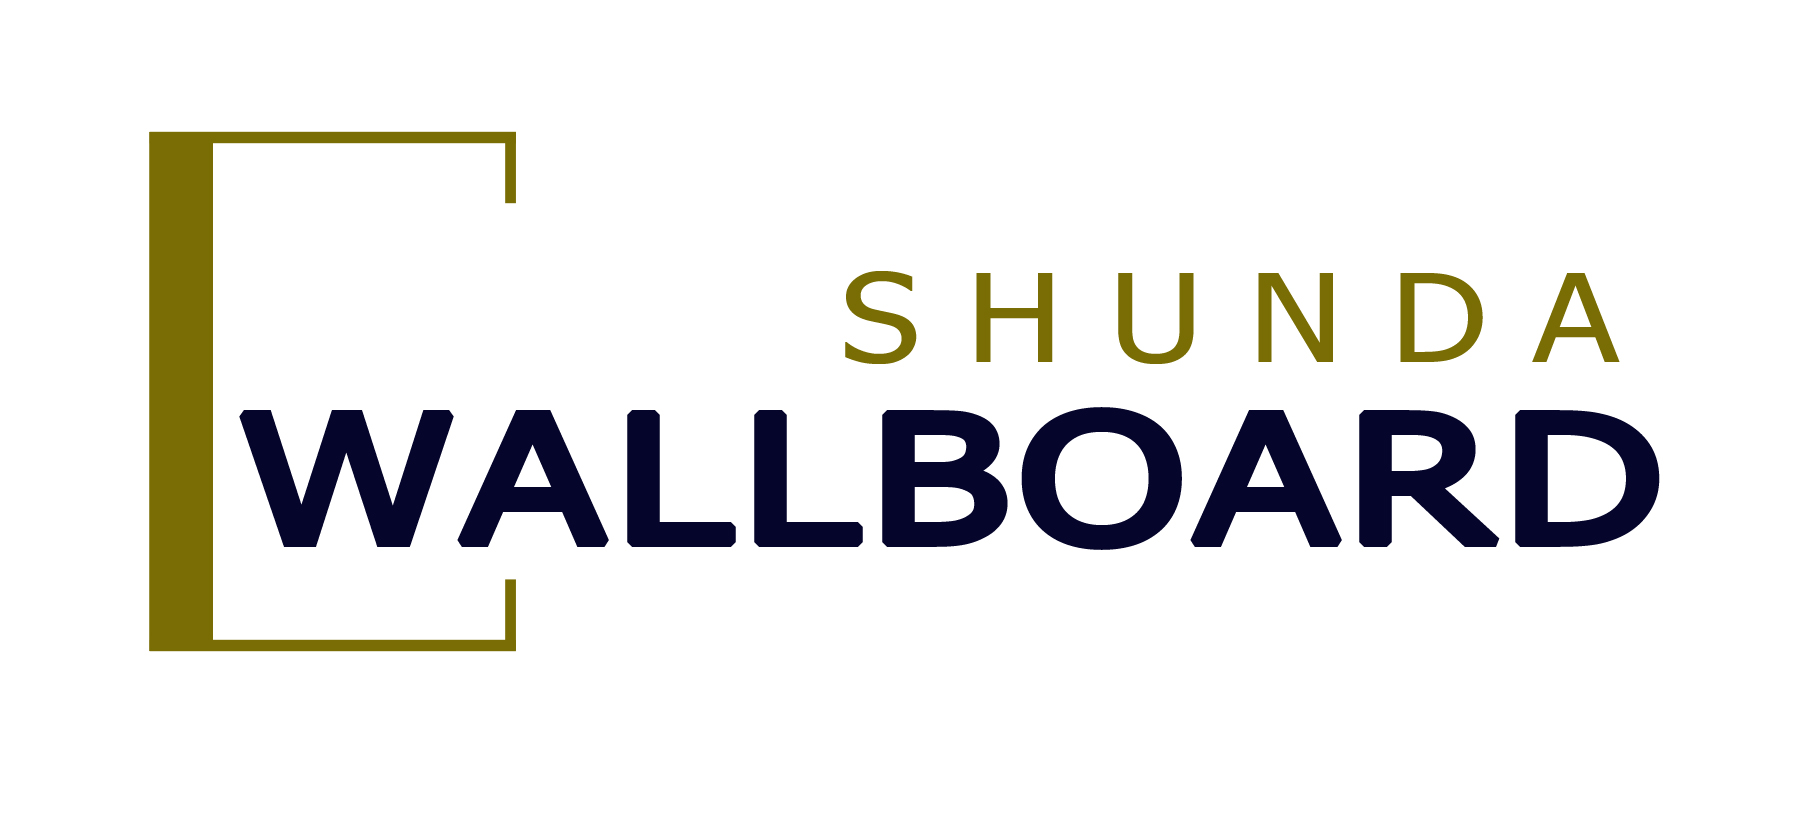 shunda wallboard